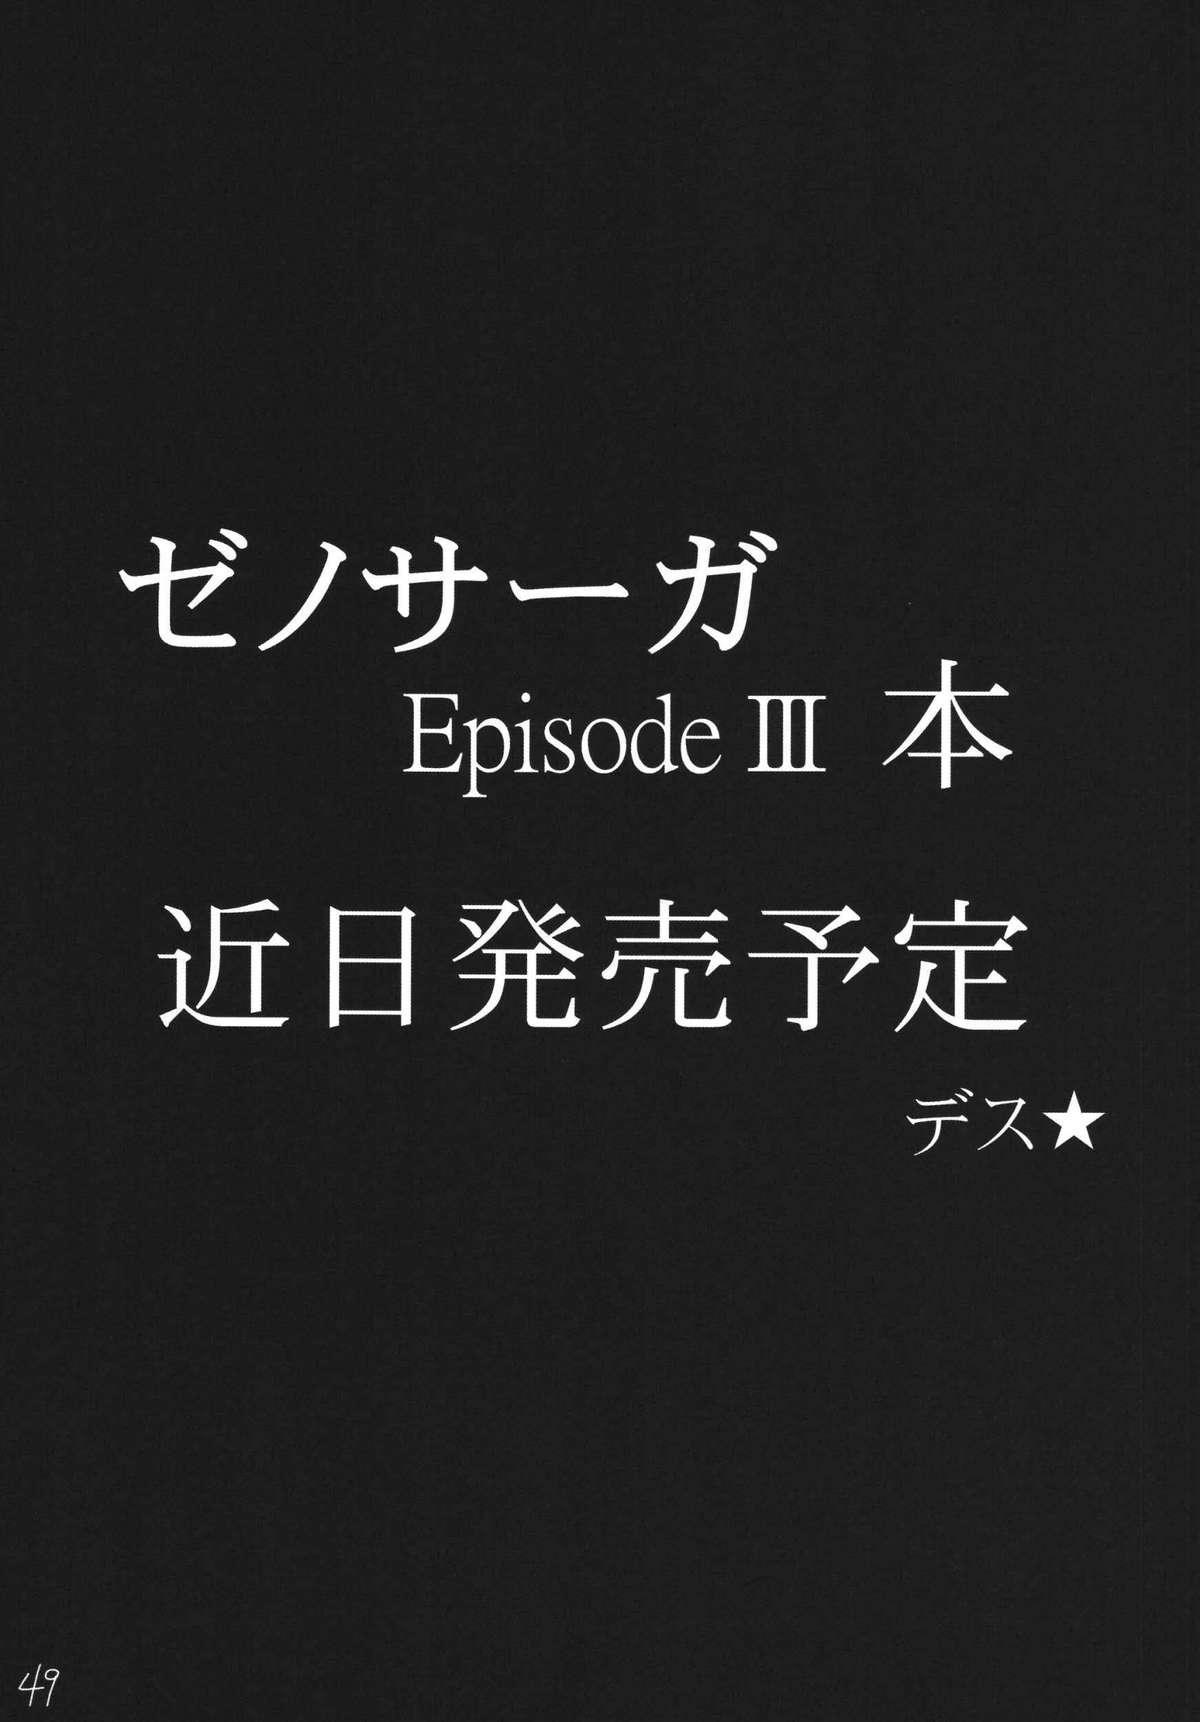 Kanimiso Vol. 4 - Love Dynamites 47